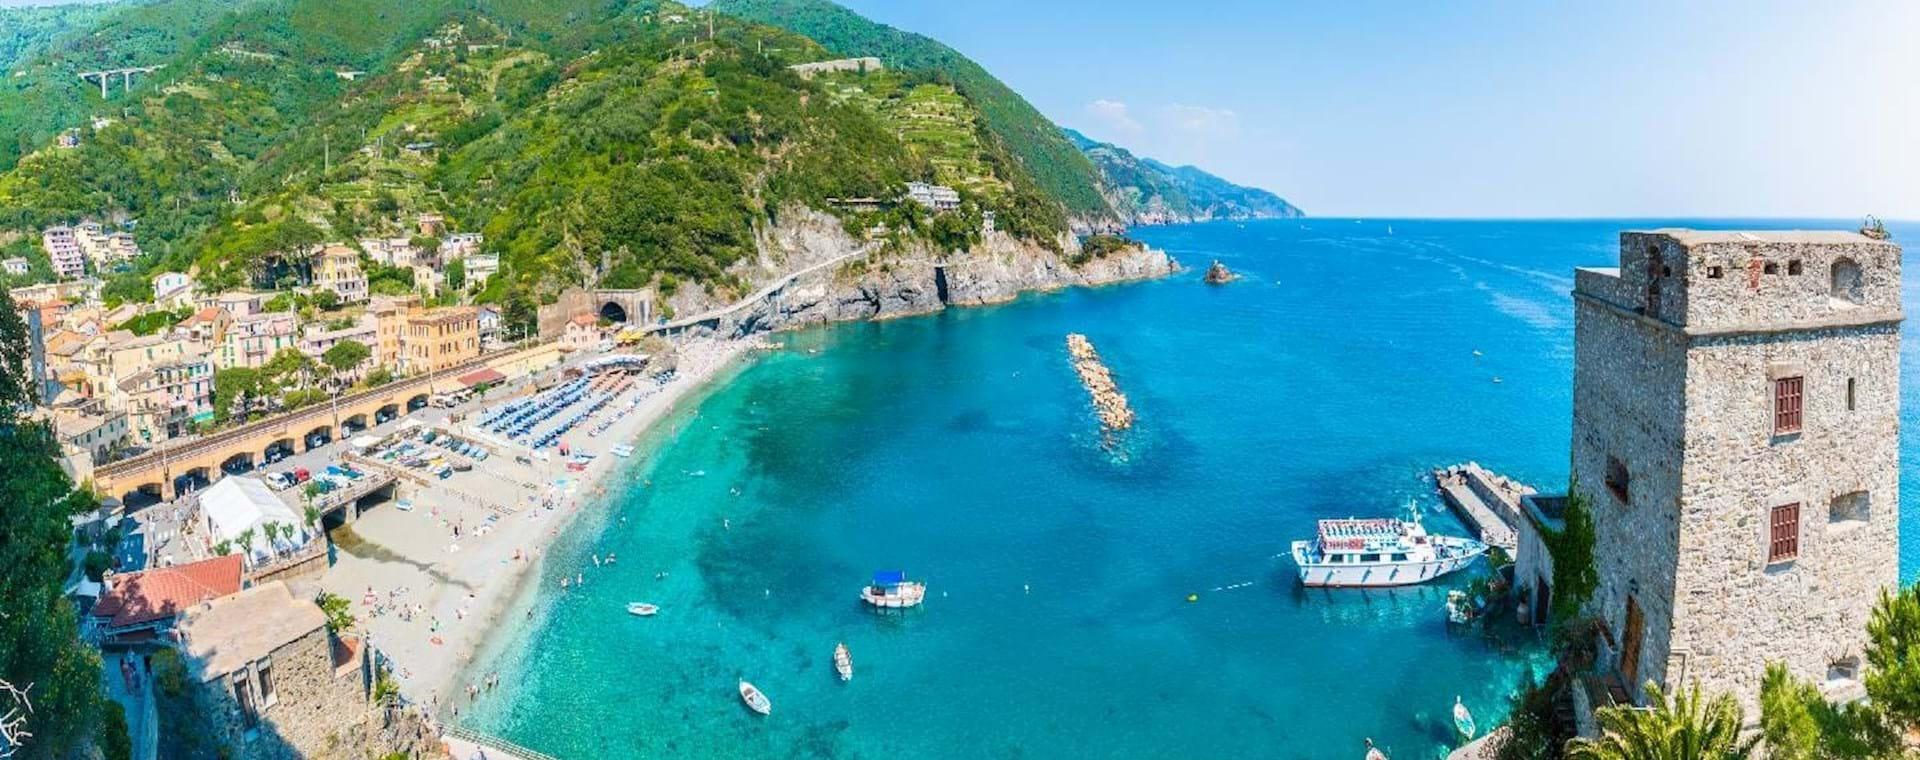 Cinque Terre & Portovenere Day Trip from Milan